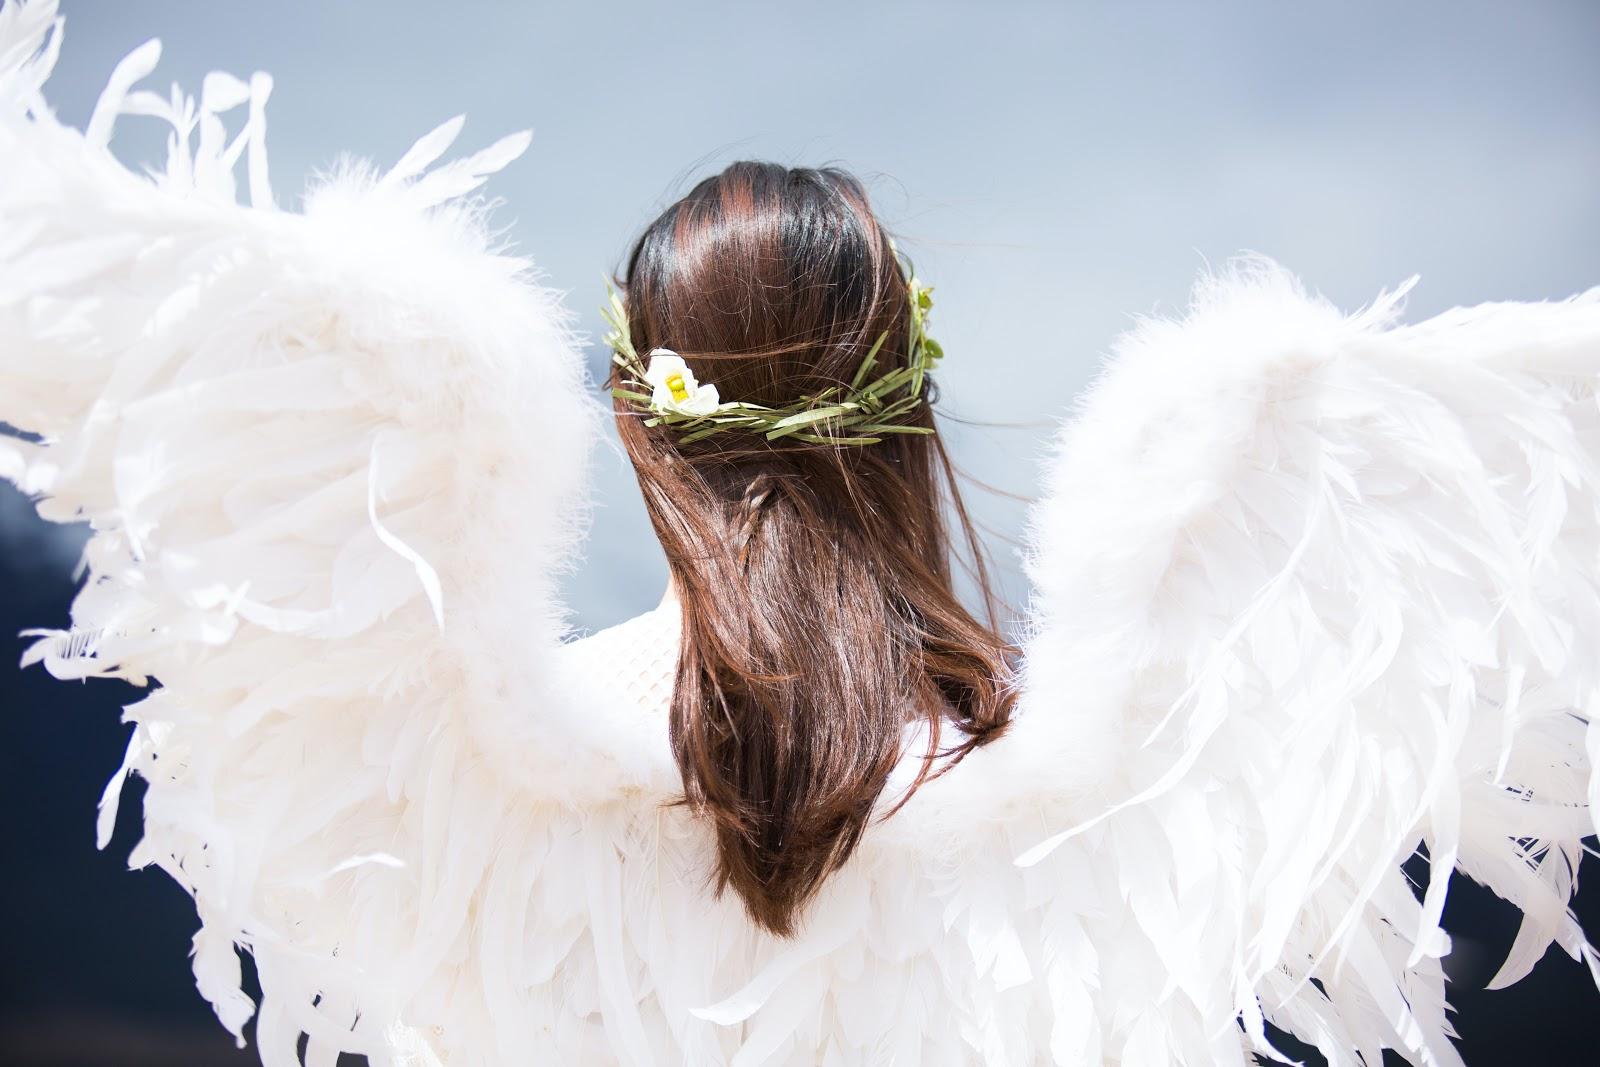 The 1313 angel number (superstitions & secrets)